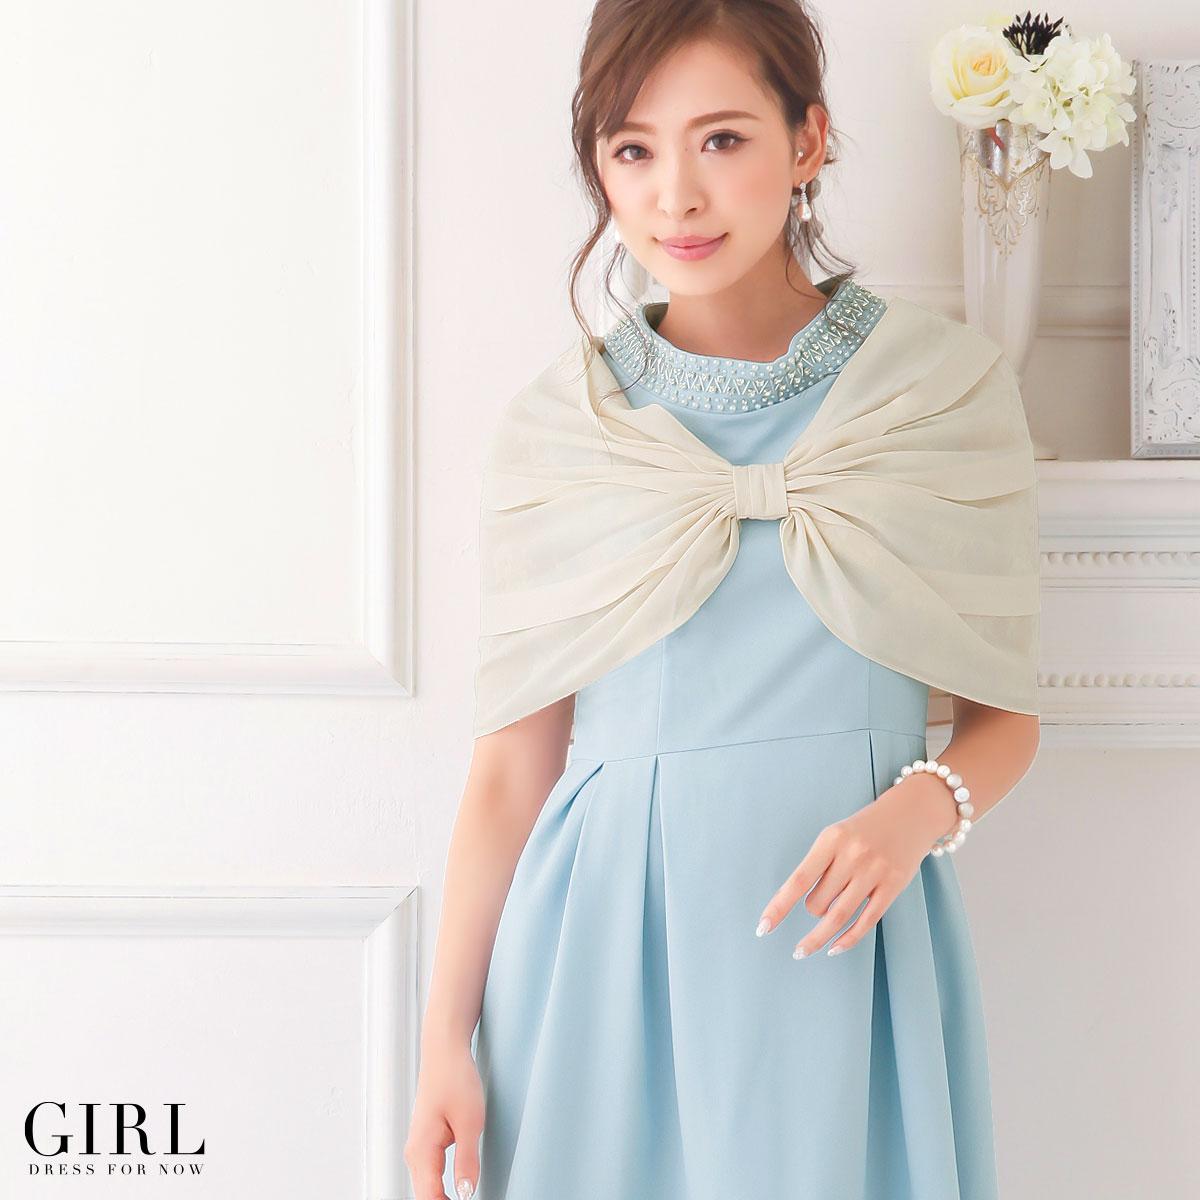 4660d4d9b2a78 結婚式 ドレス ケープ